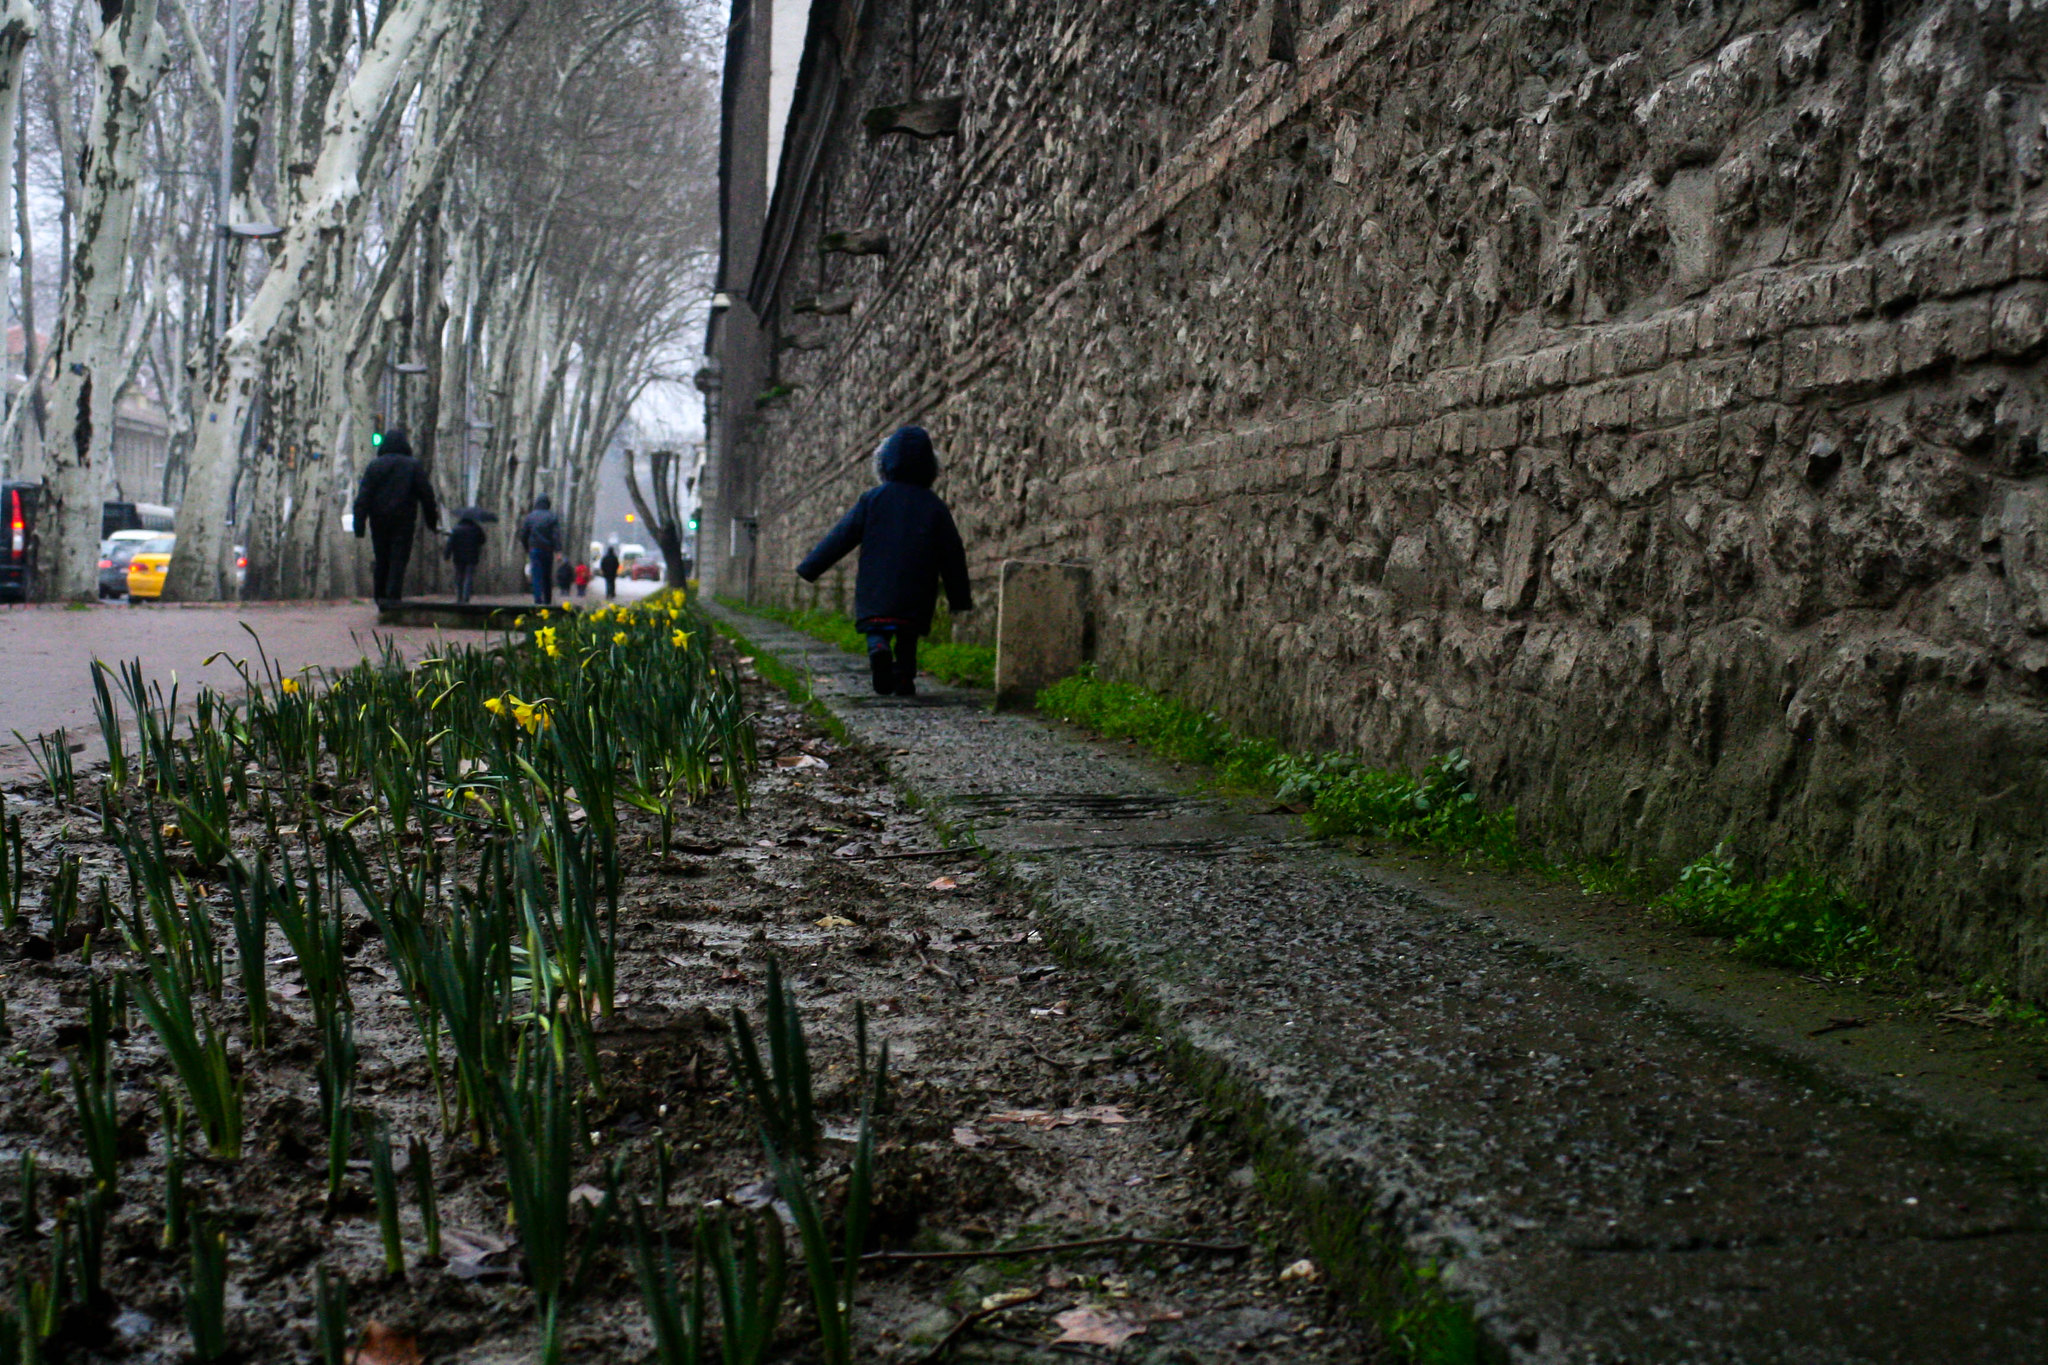 Running down Dolmabahçe Caddesi